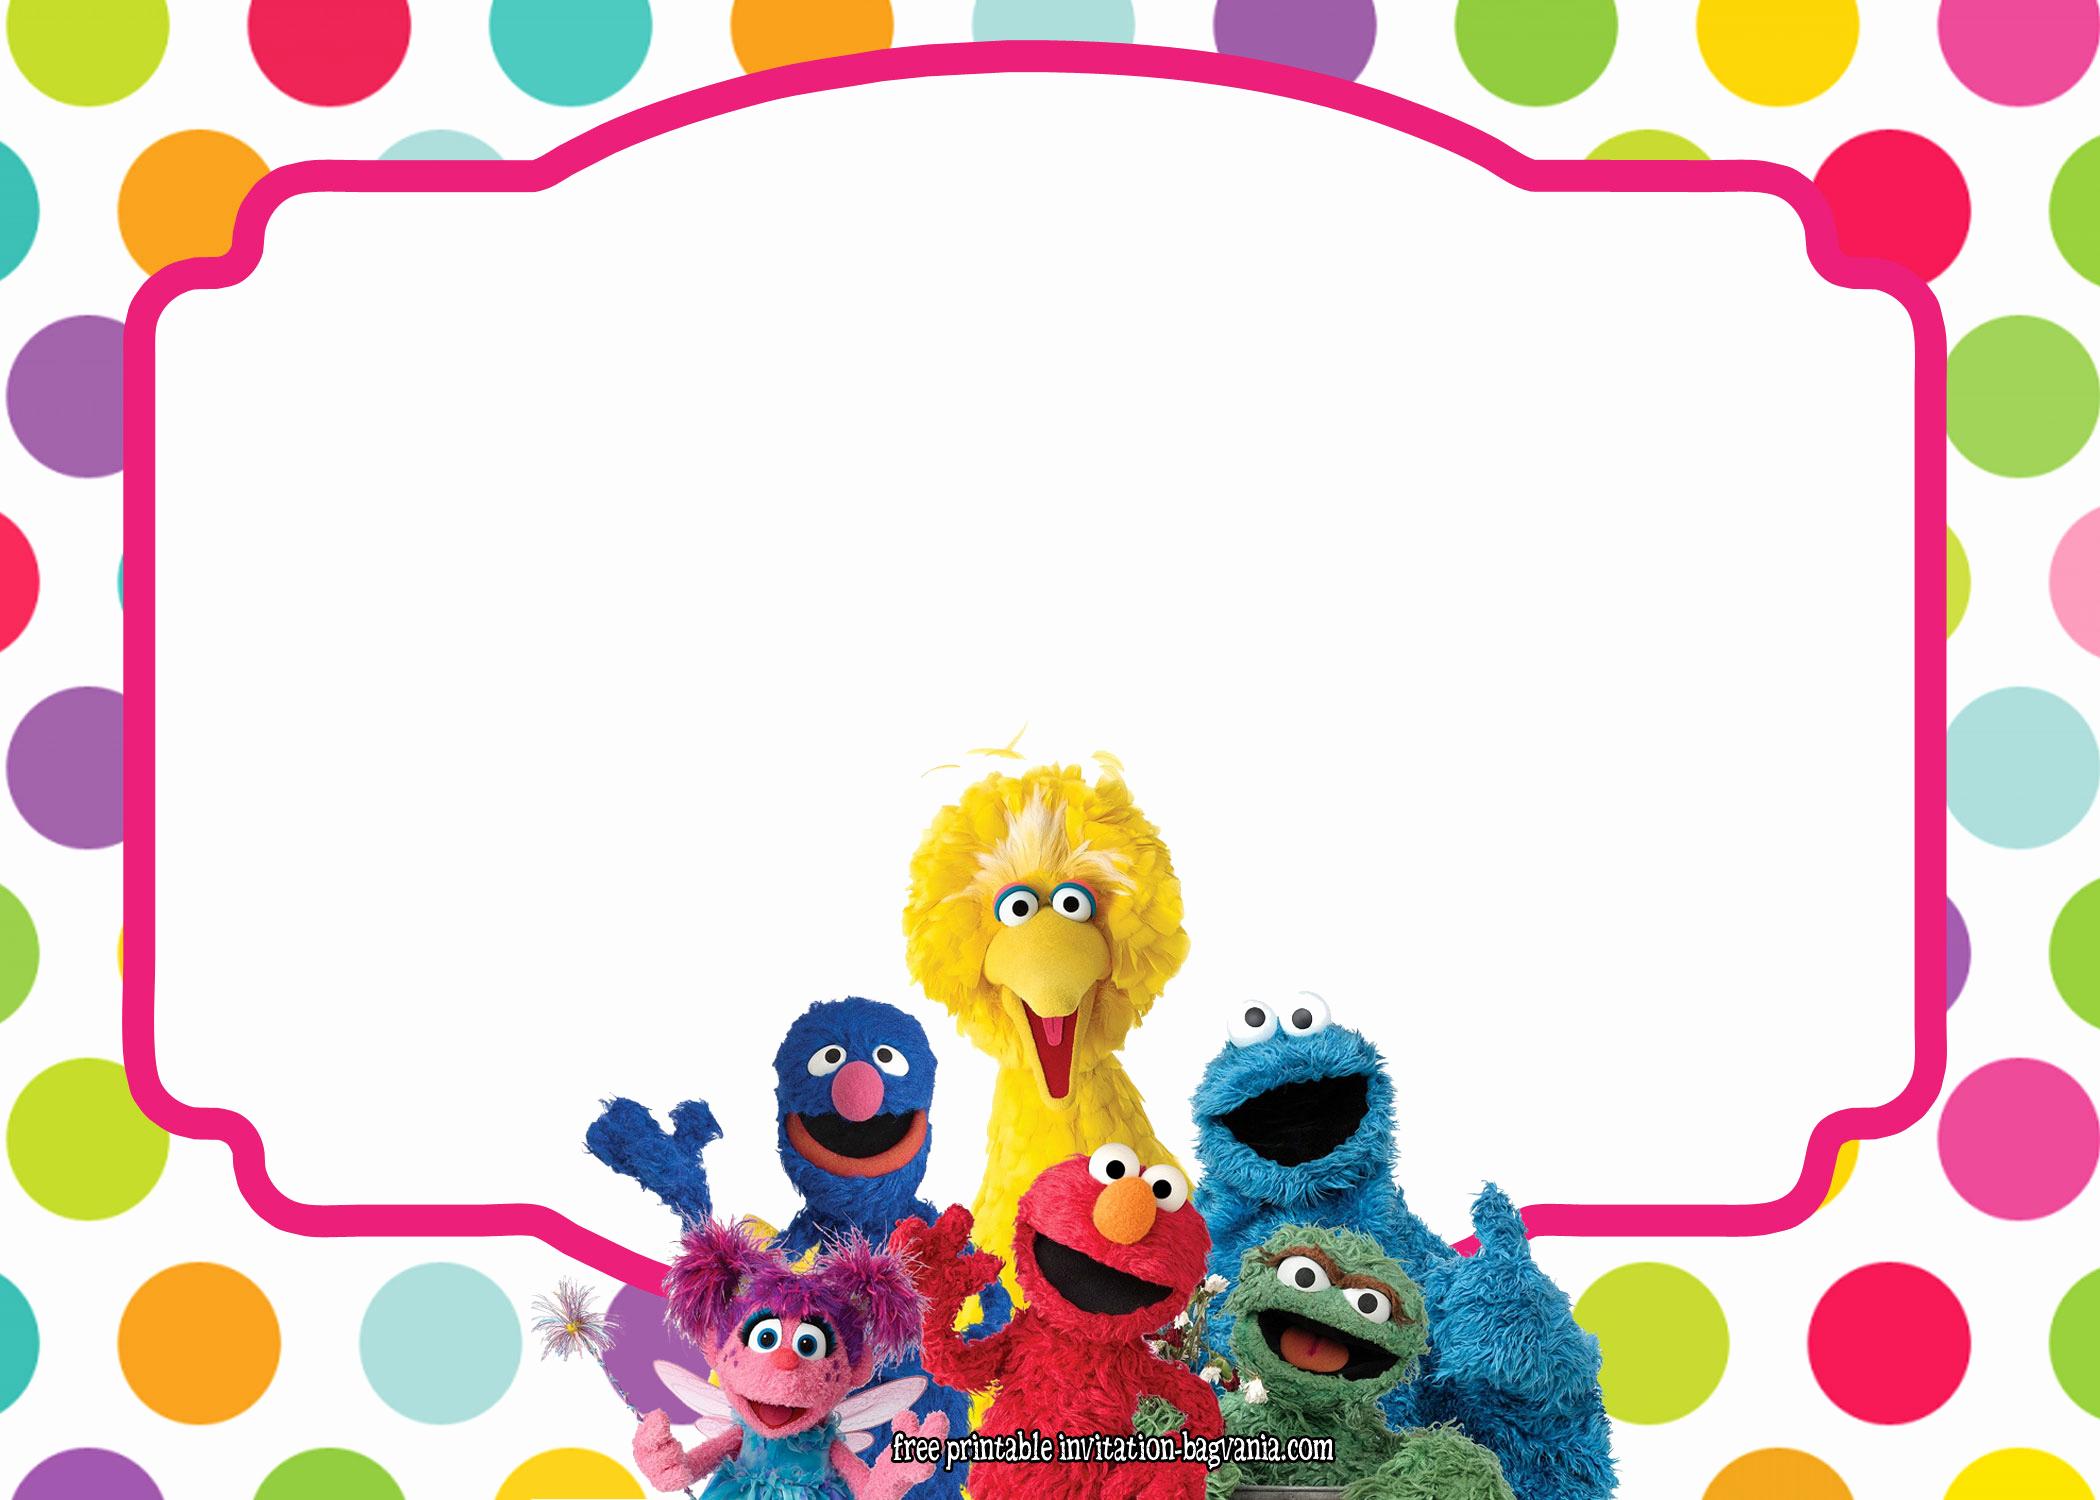 Sesame Street Birthday Invitation Templates Beautiful Sesame Street All Characters Invitation Template – Free